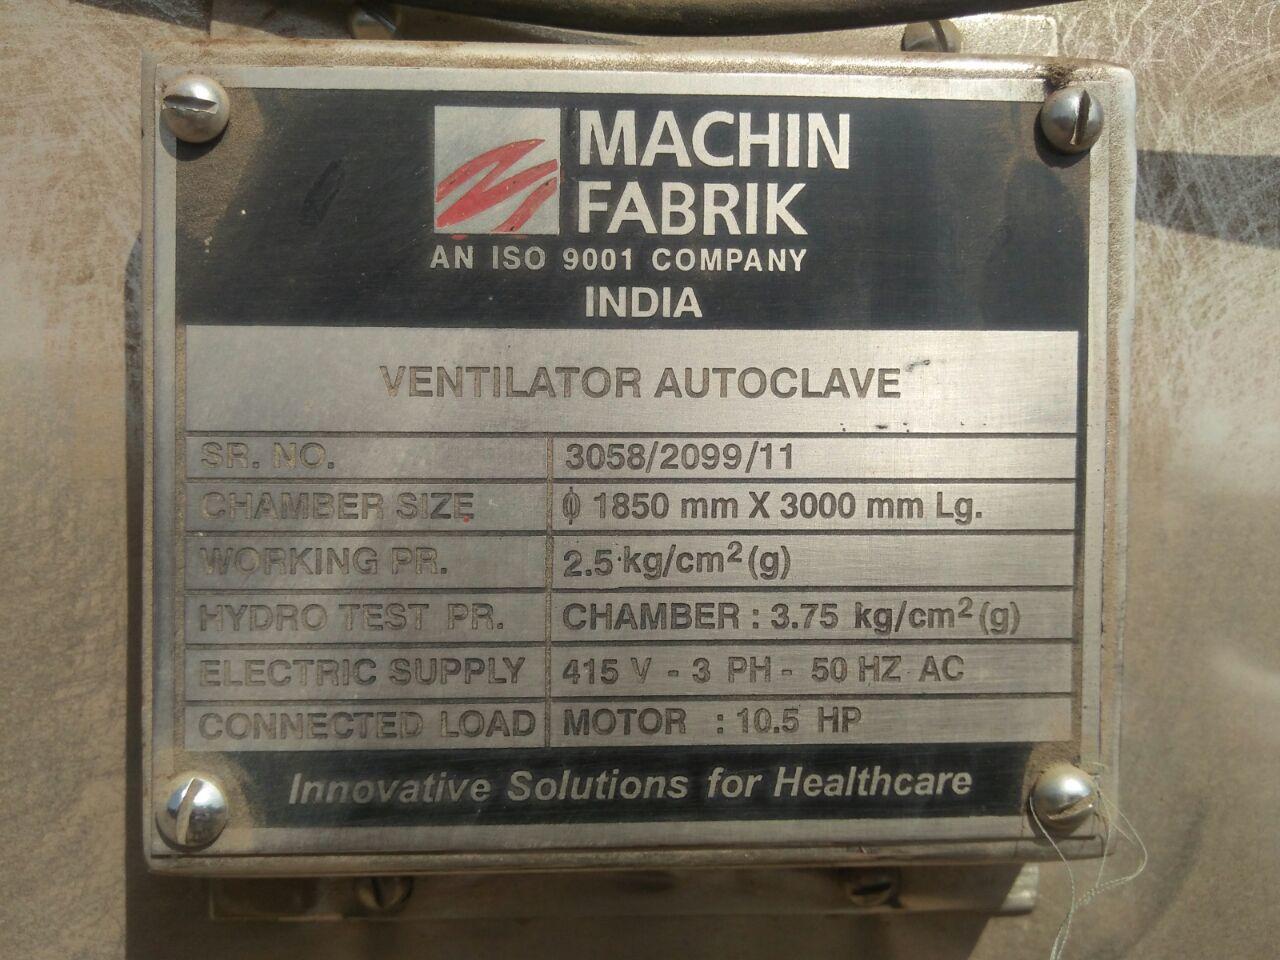 Ventilator auto clave.1